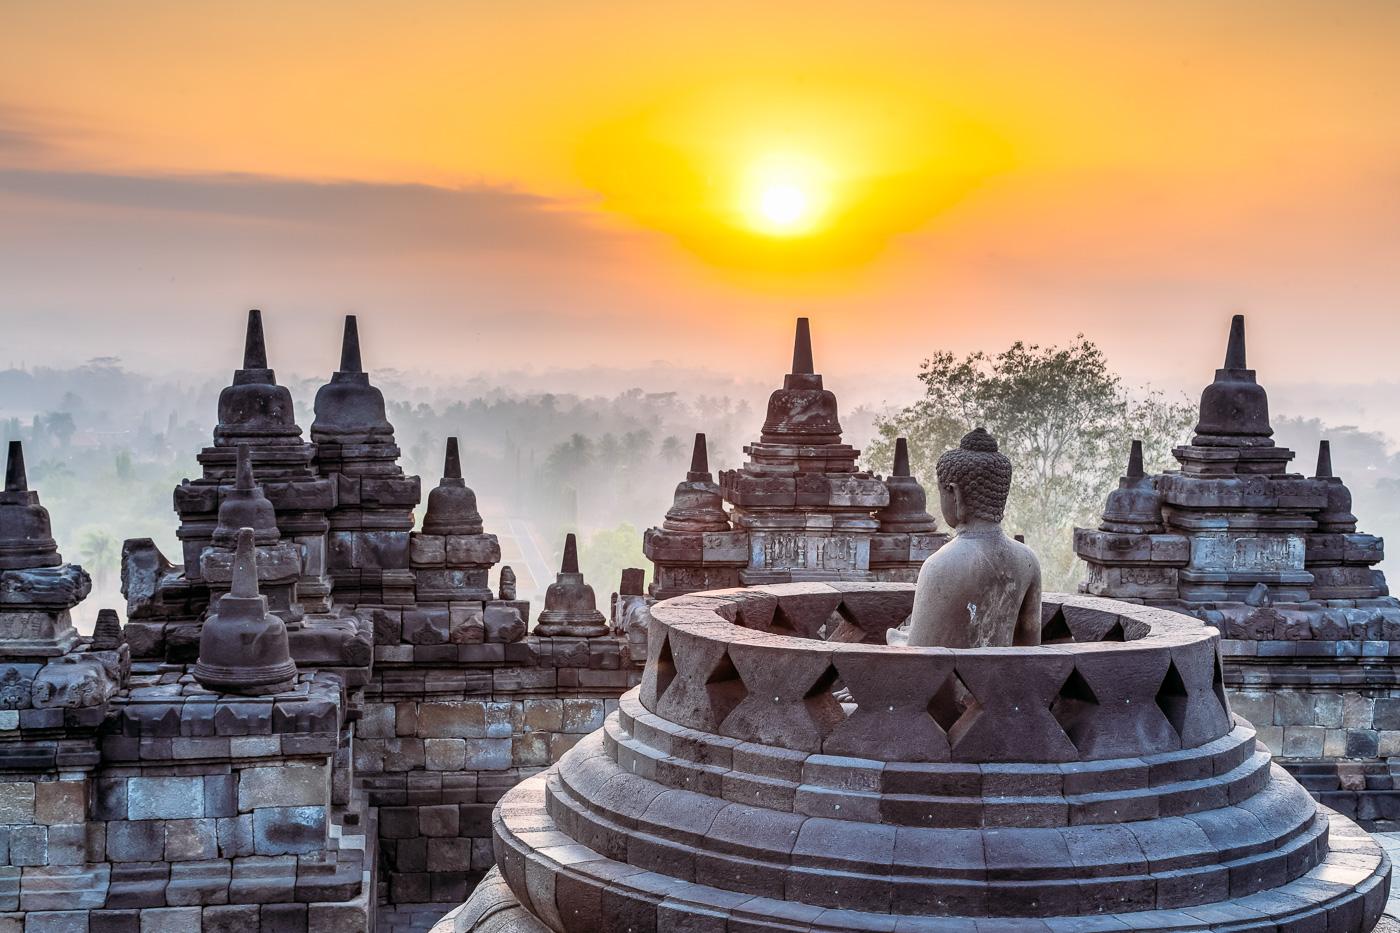 Paket Wisata Magelang 2 Hari 1 Malam Tour Liburan Yogyakarta Terbaik